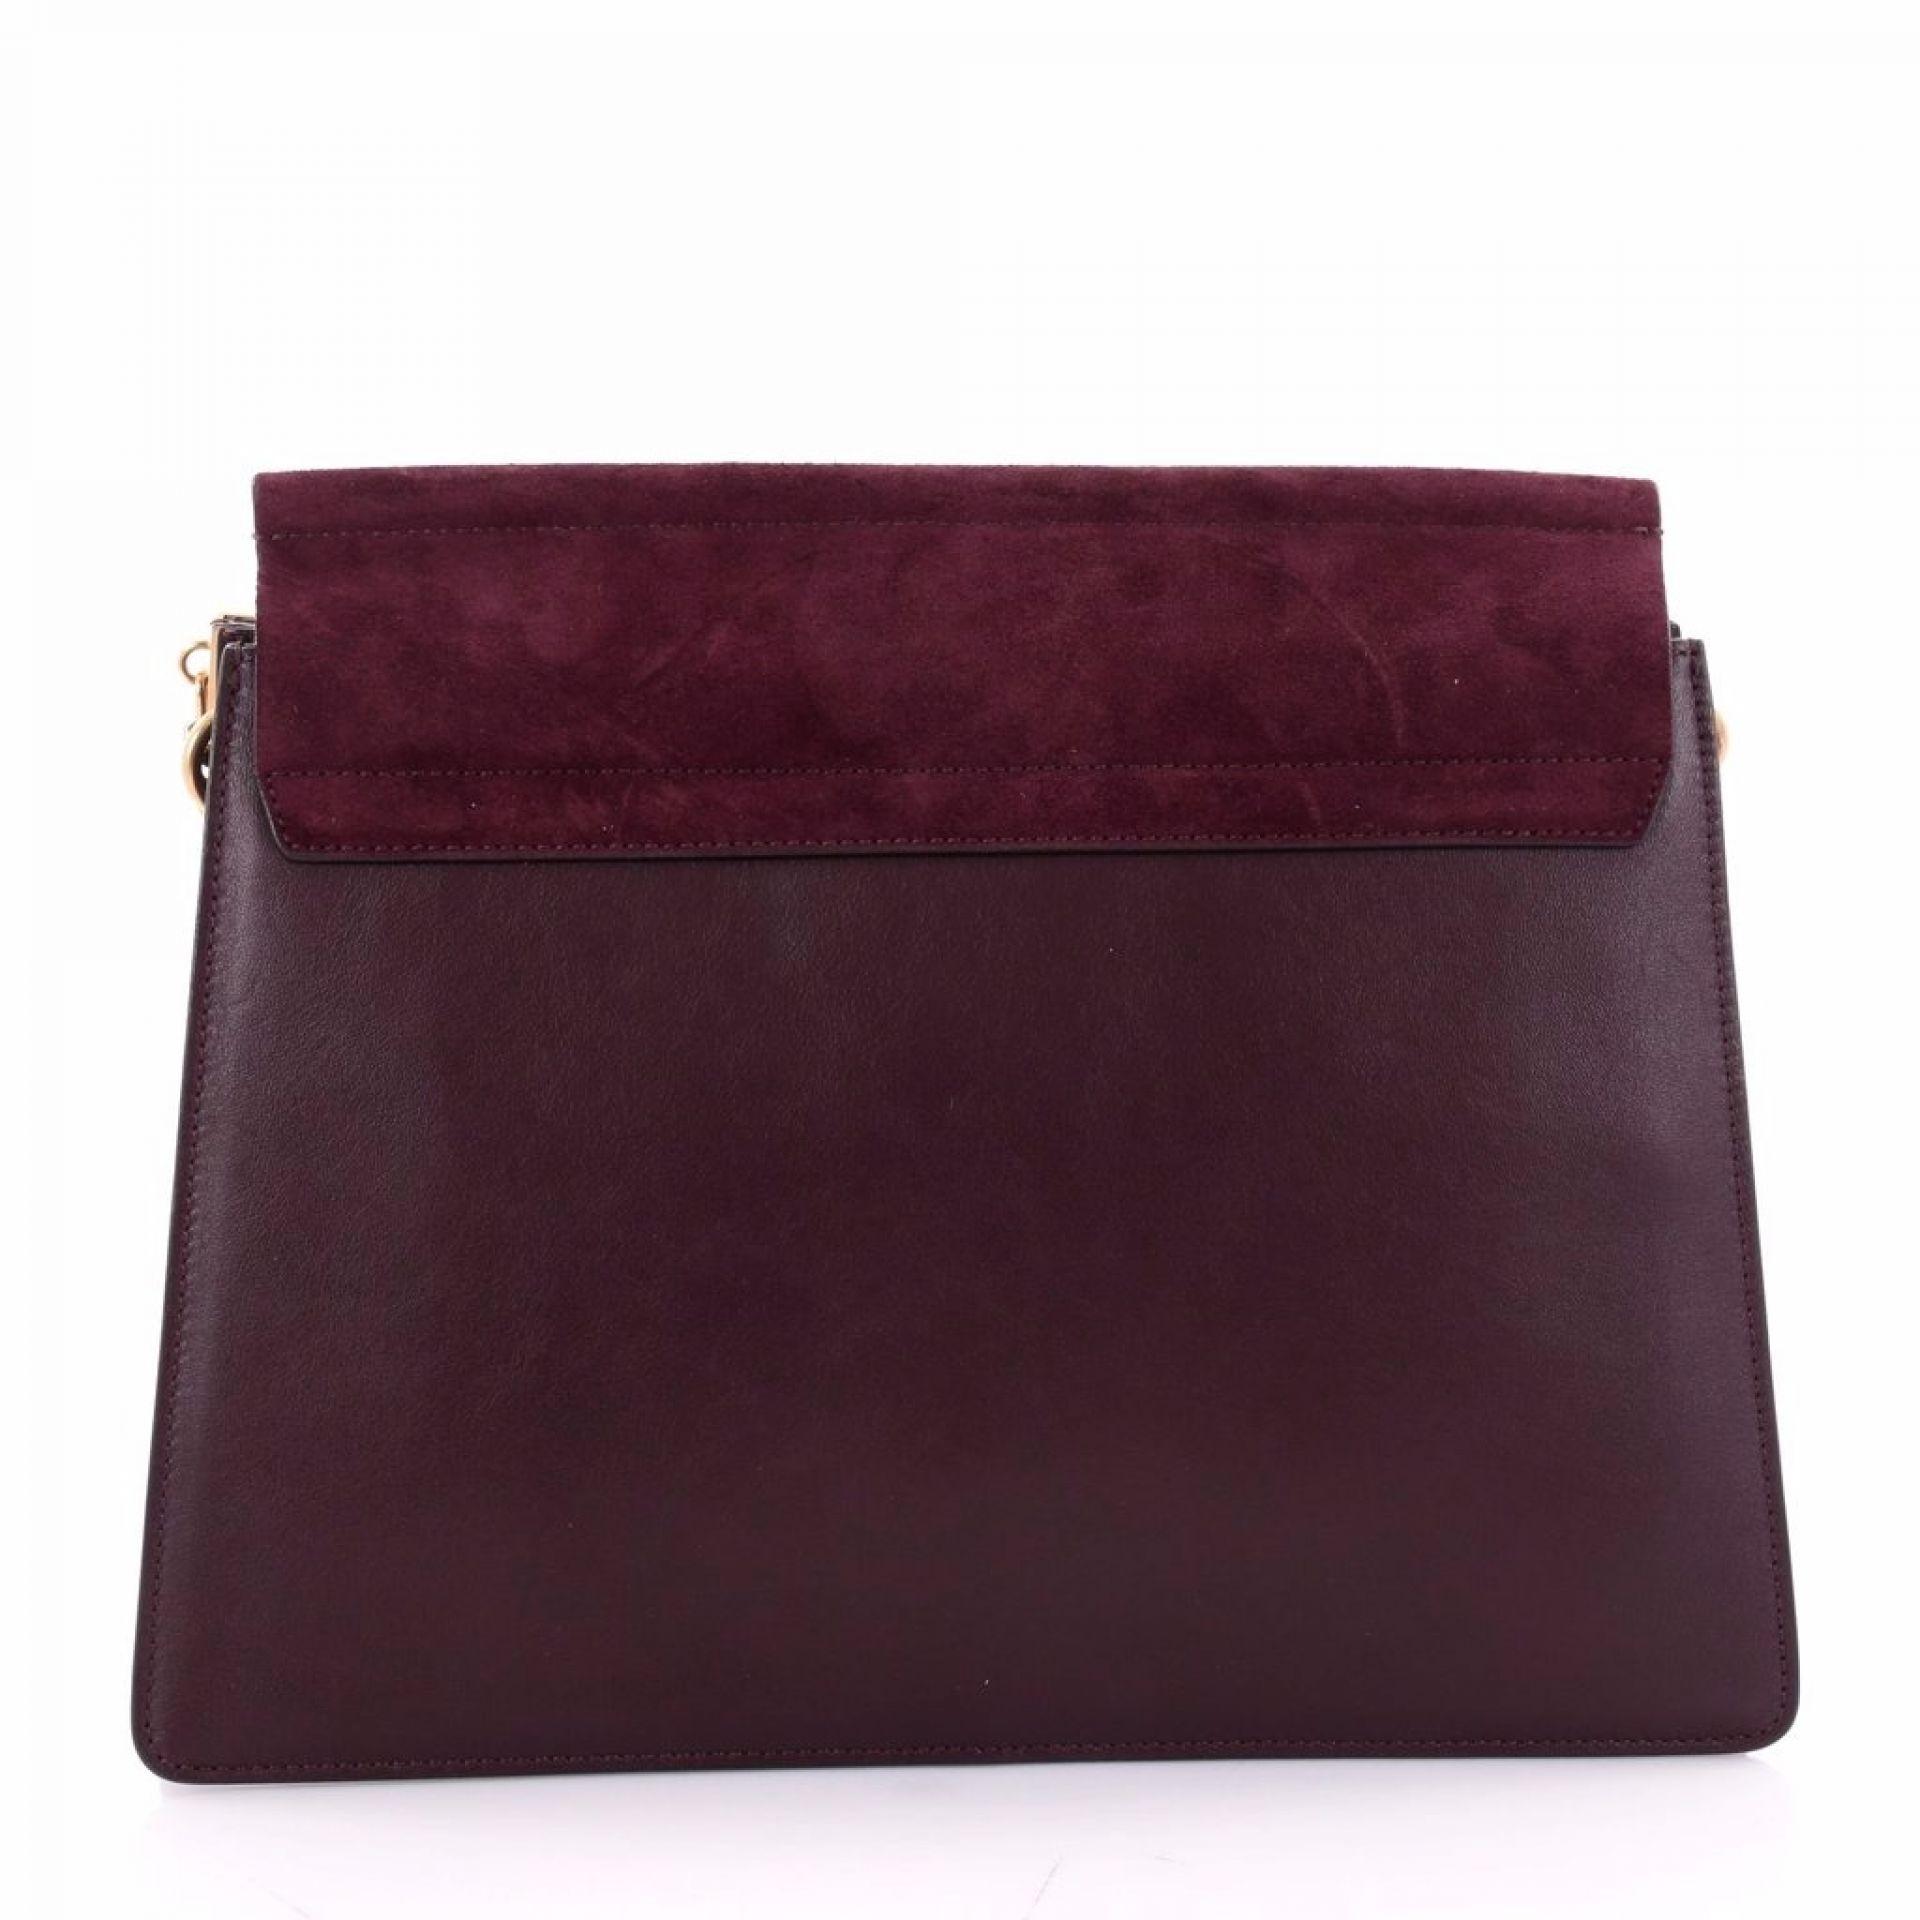 Chloe Faye Shoulder Bag Studded Leather and Suede Medium